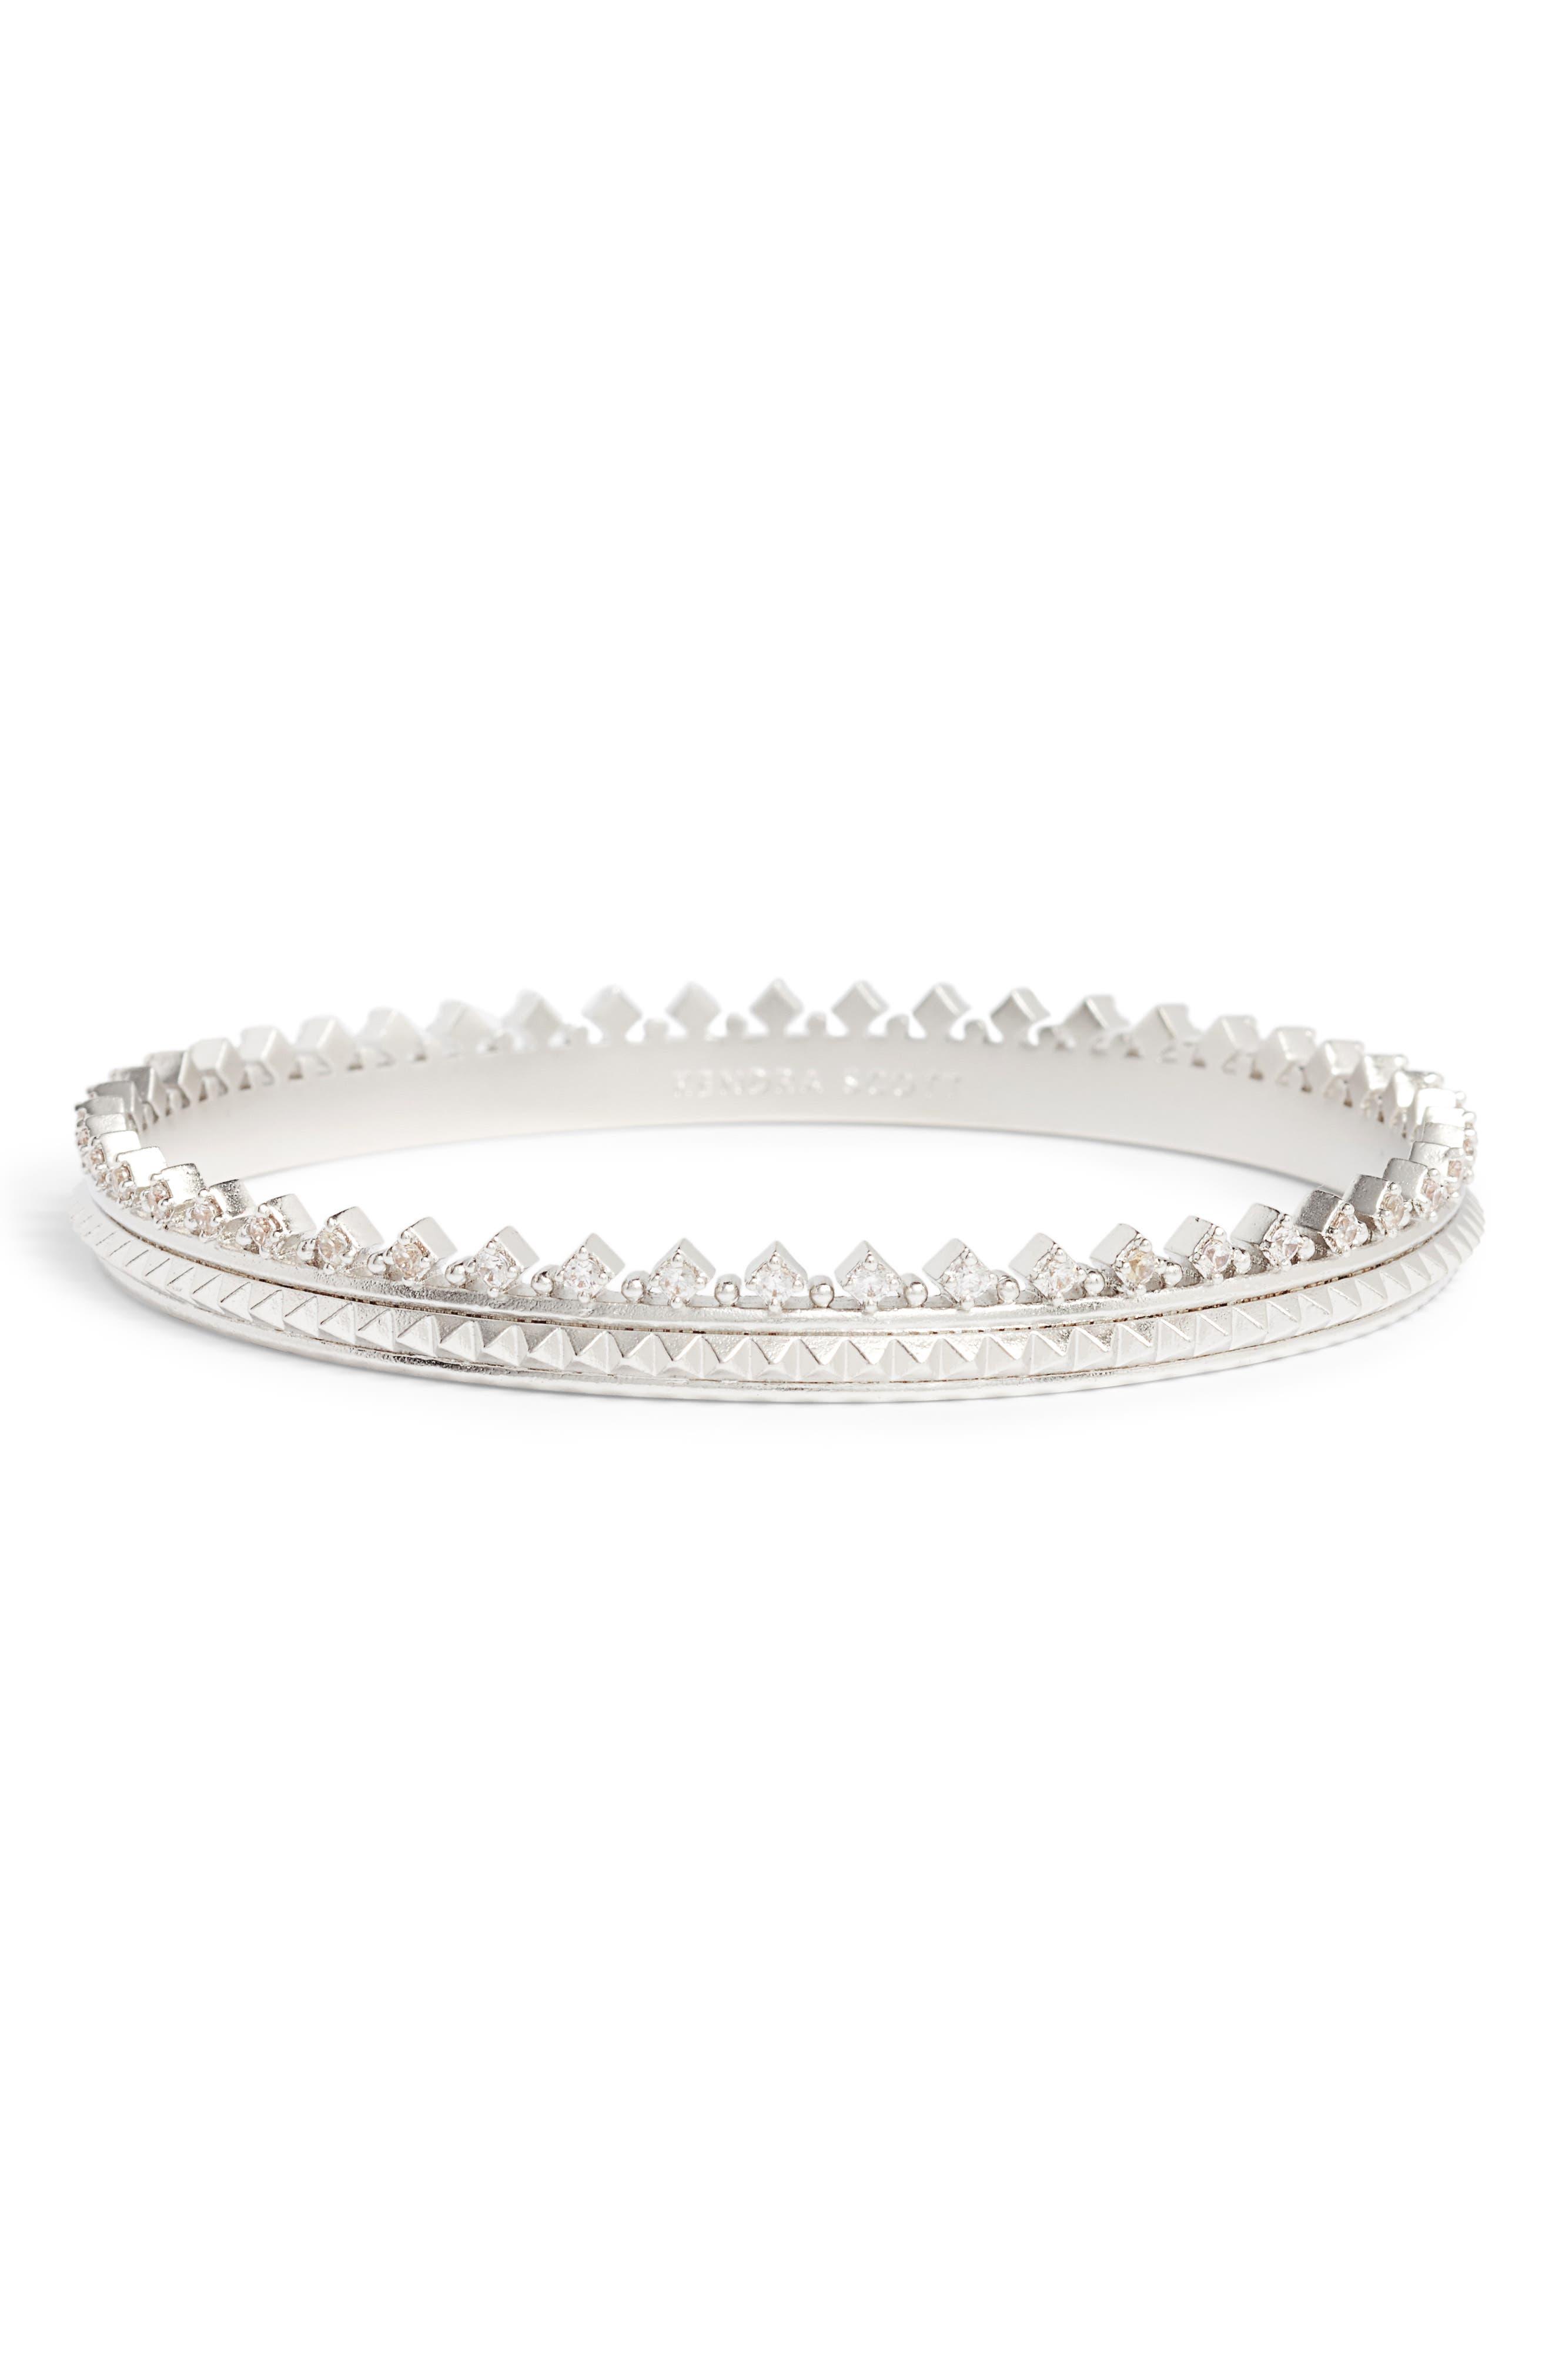 Mary Caroline Crystal Pyramid Cuff Bracelet,                             Main thumbnail 1, color,                             040